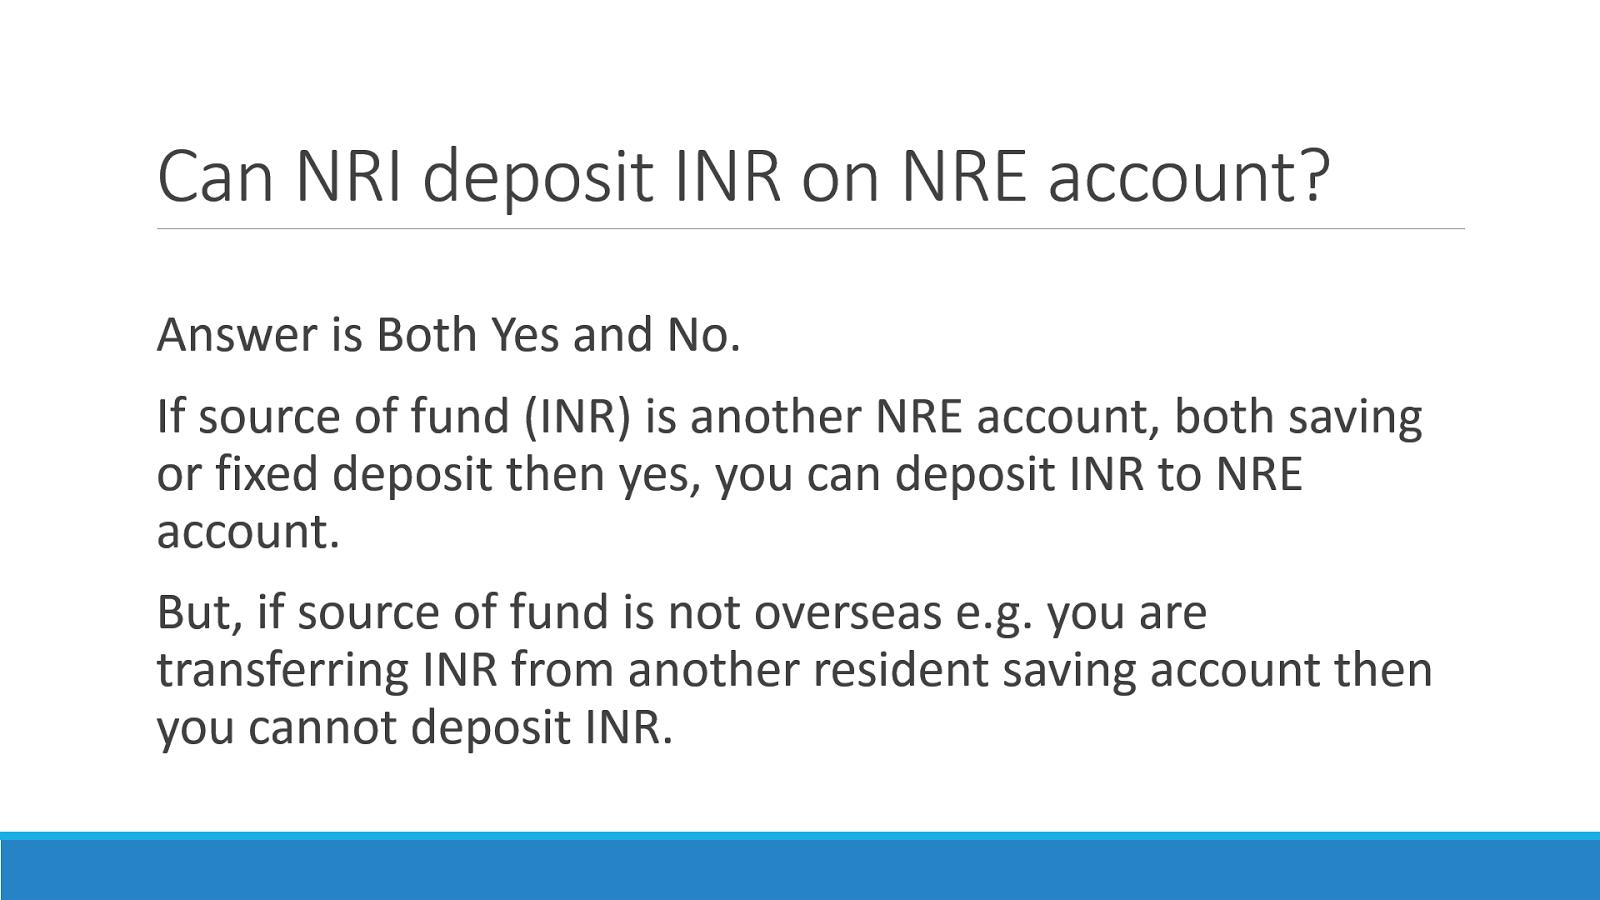 Nri Deposit Inr In Nre Account India